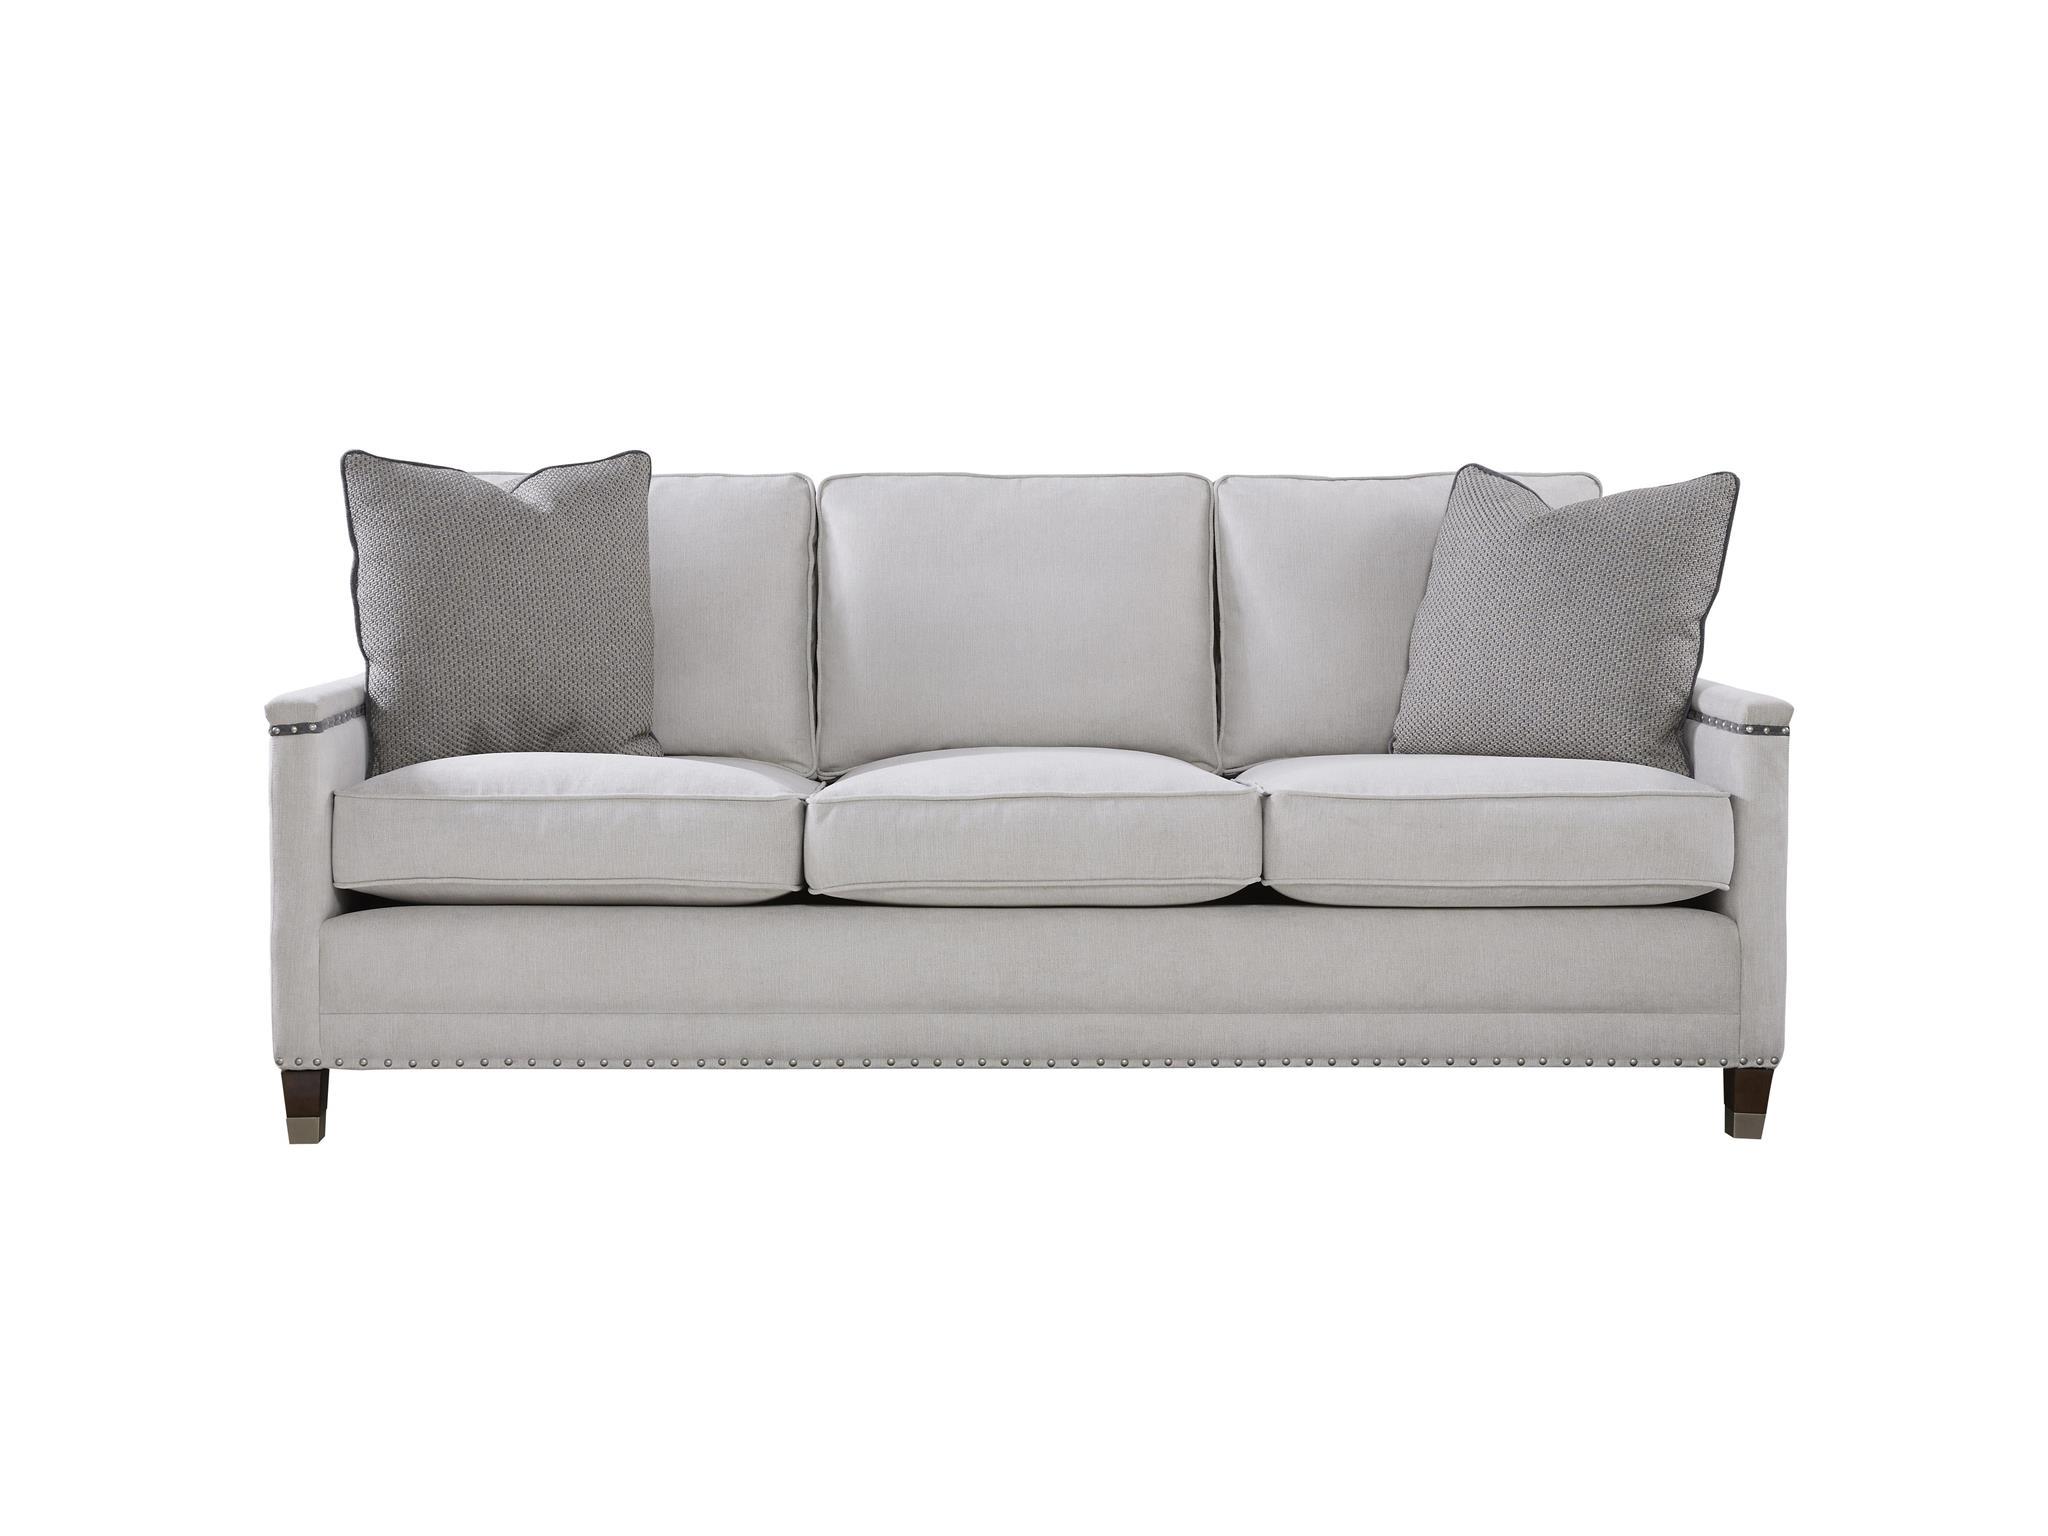 Universal Furniture Modern Merrill Sofa